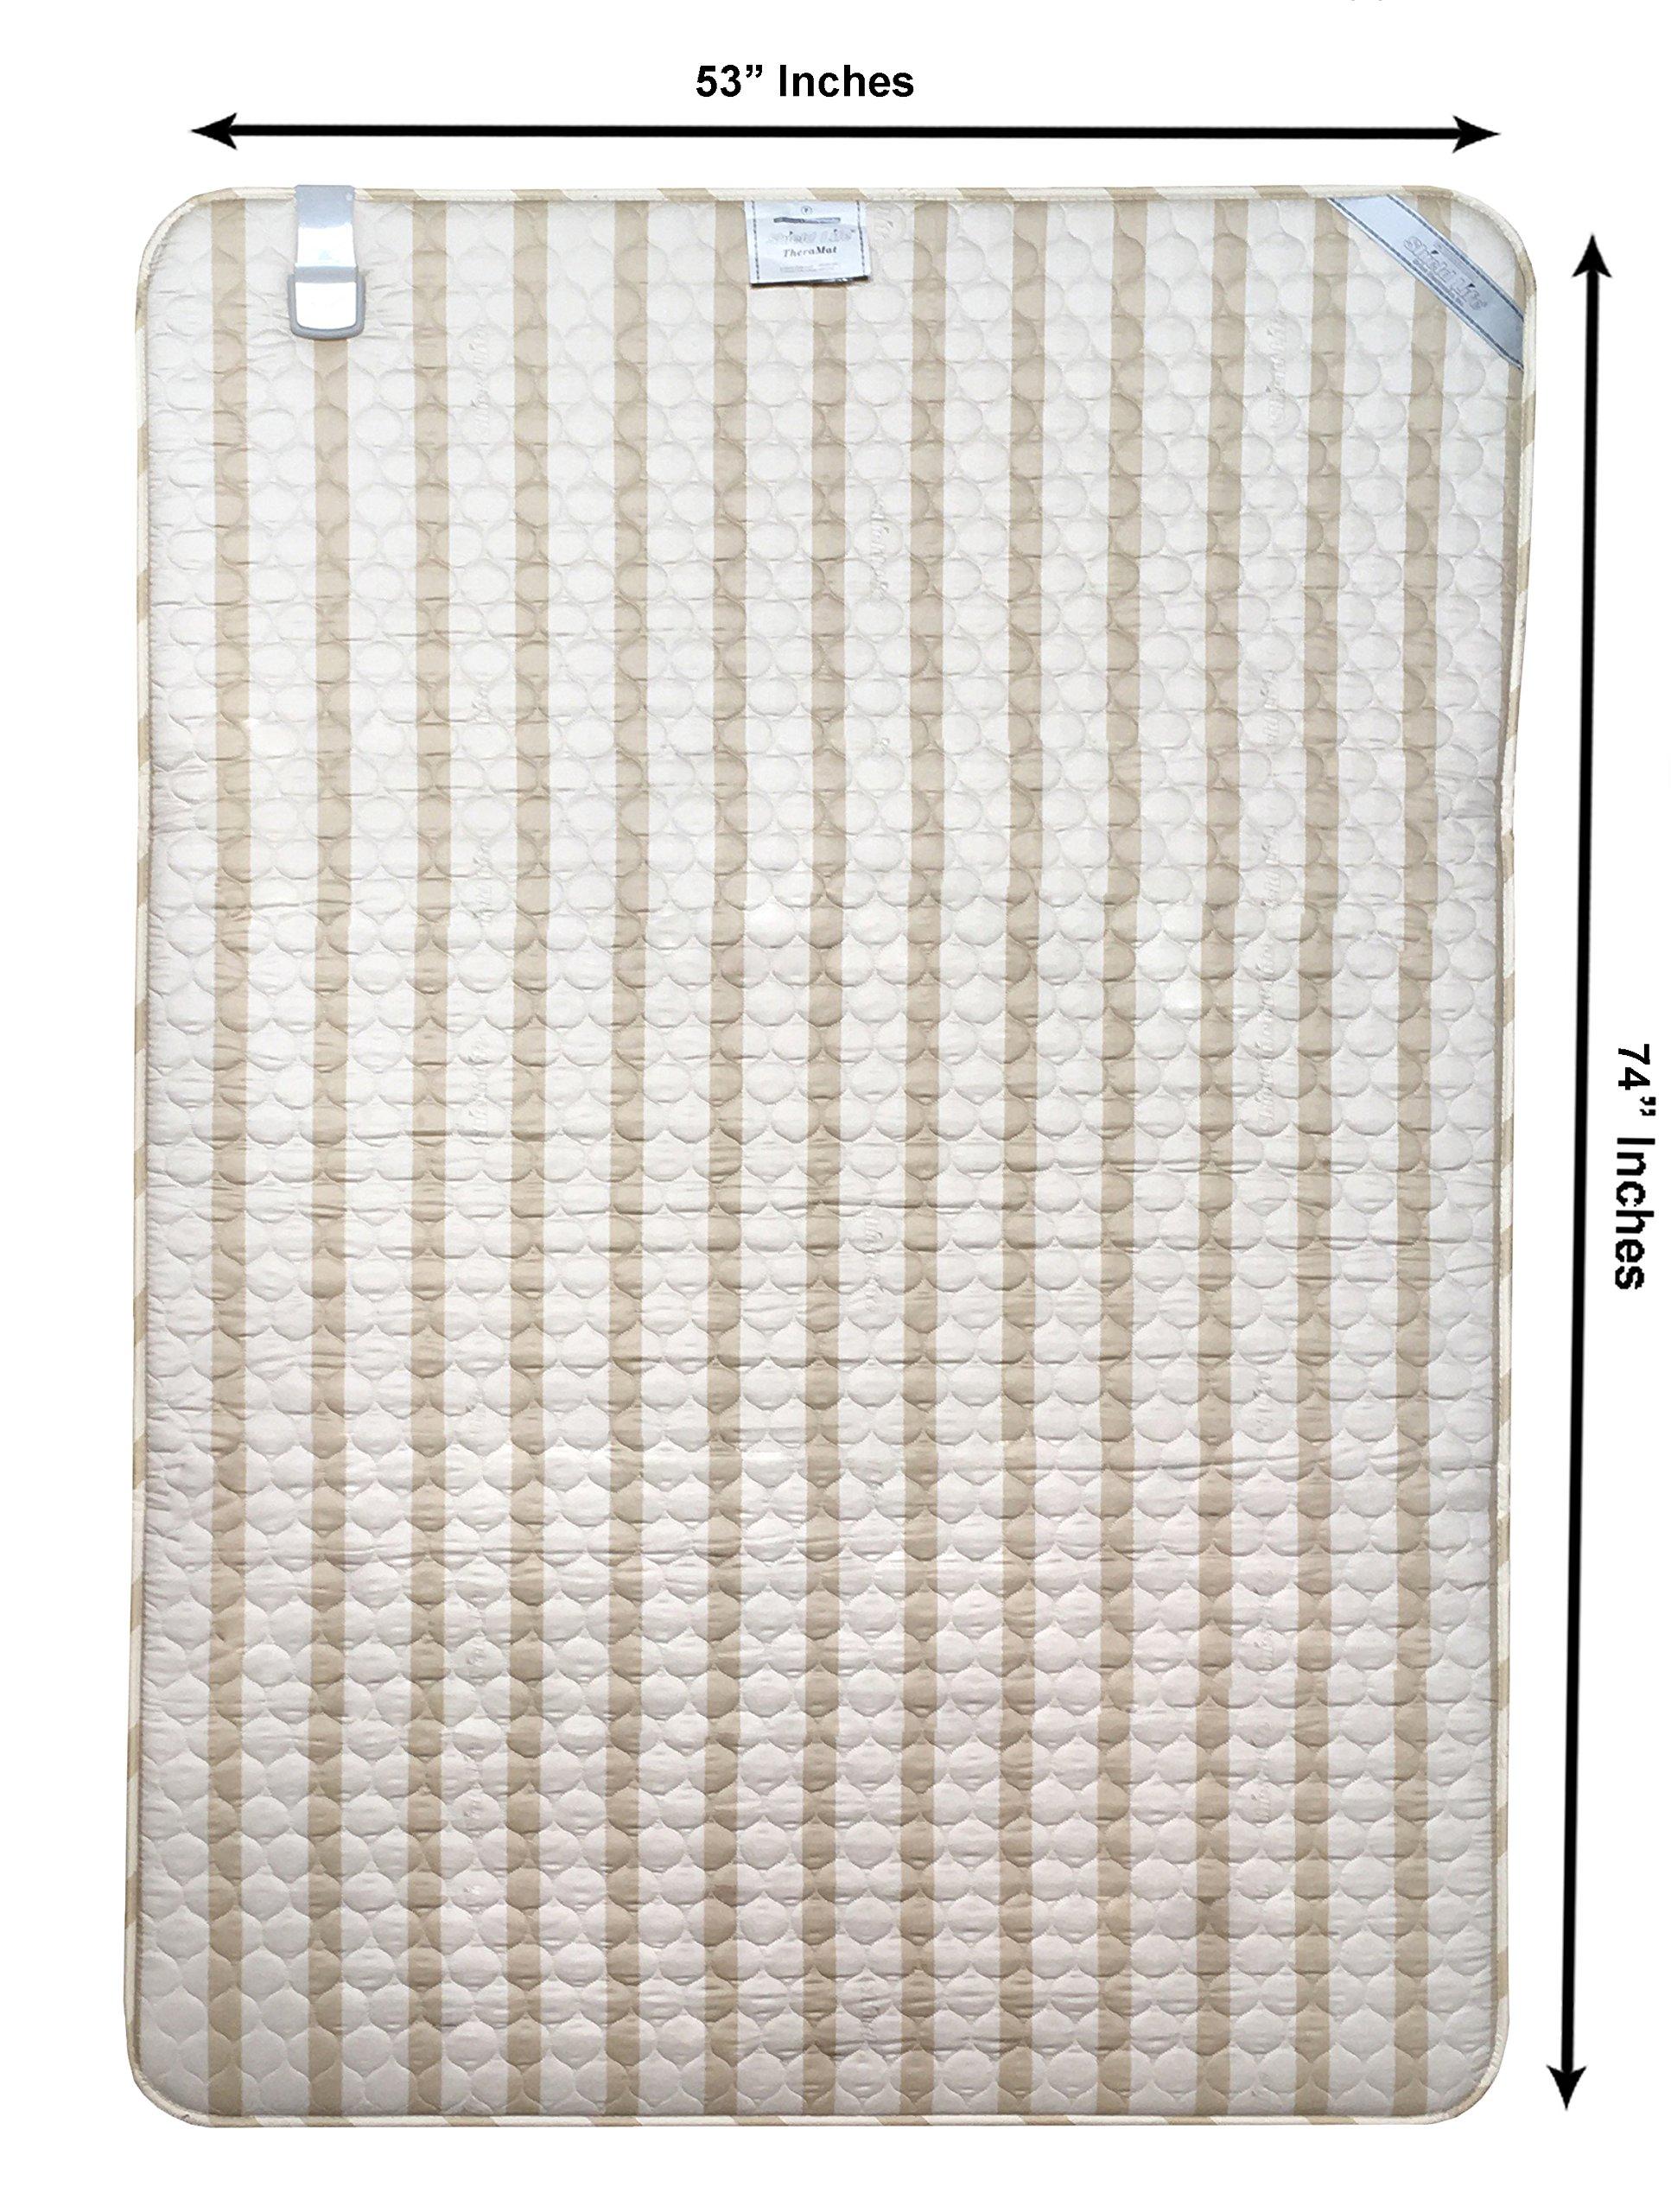 Shield Life Theramat FULL Far Infrared Heated Mattress